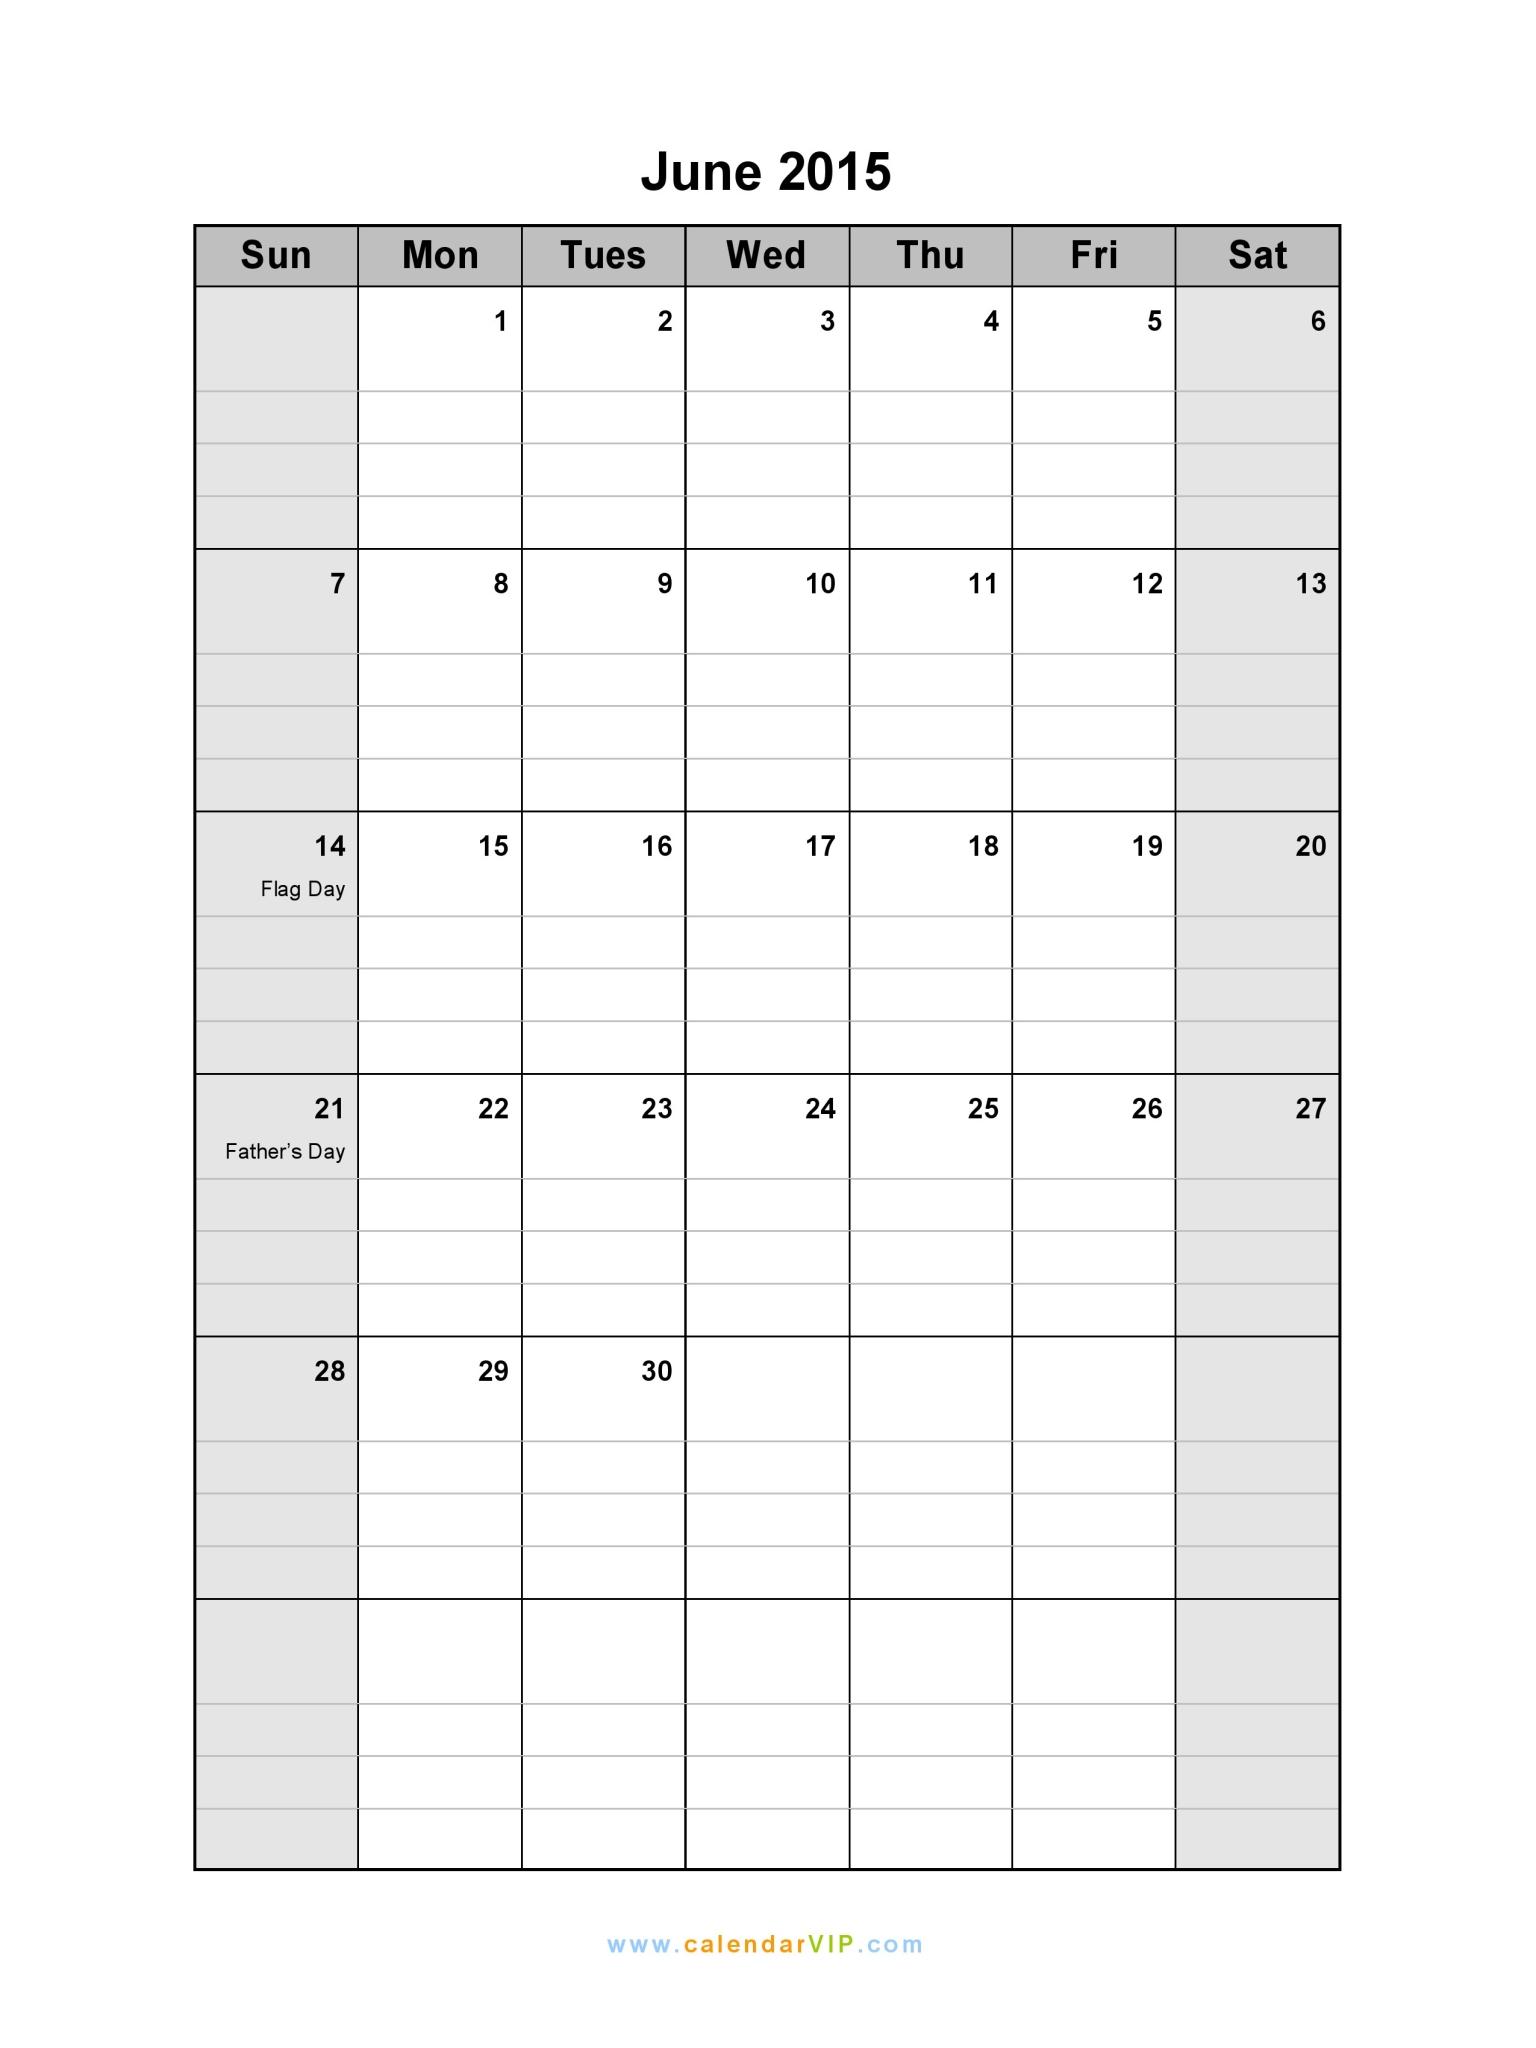 June 2015 Calendar - Blank Printable Calendar Template In Pdf Word Excel with regard to Monthly Calendar Printable Blank Pdf